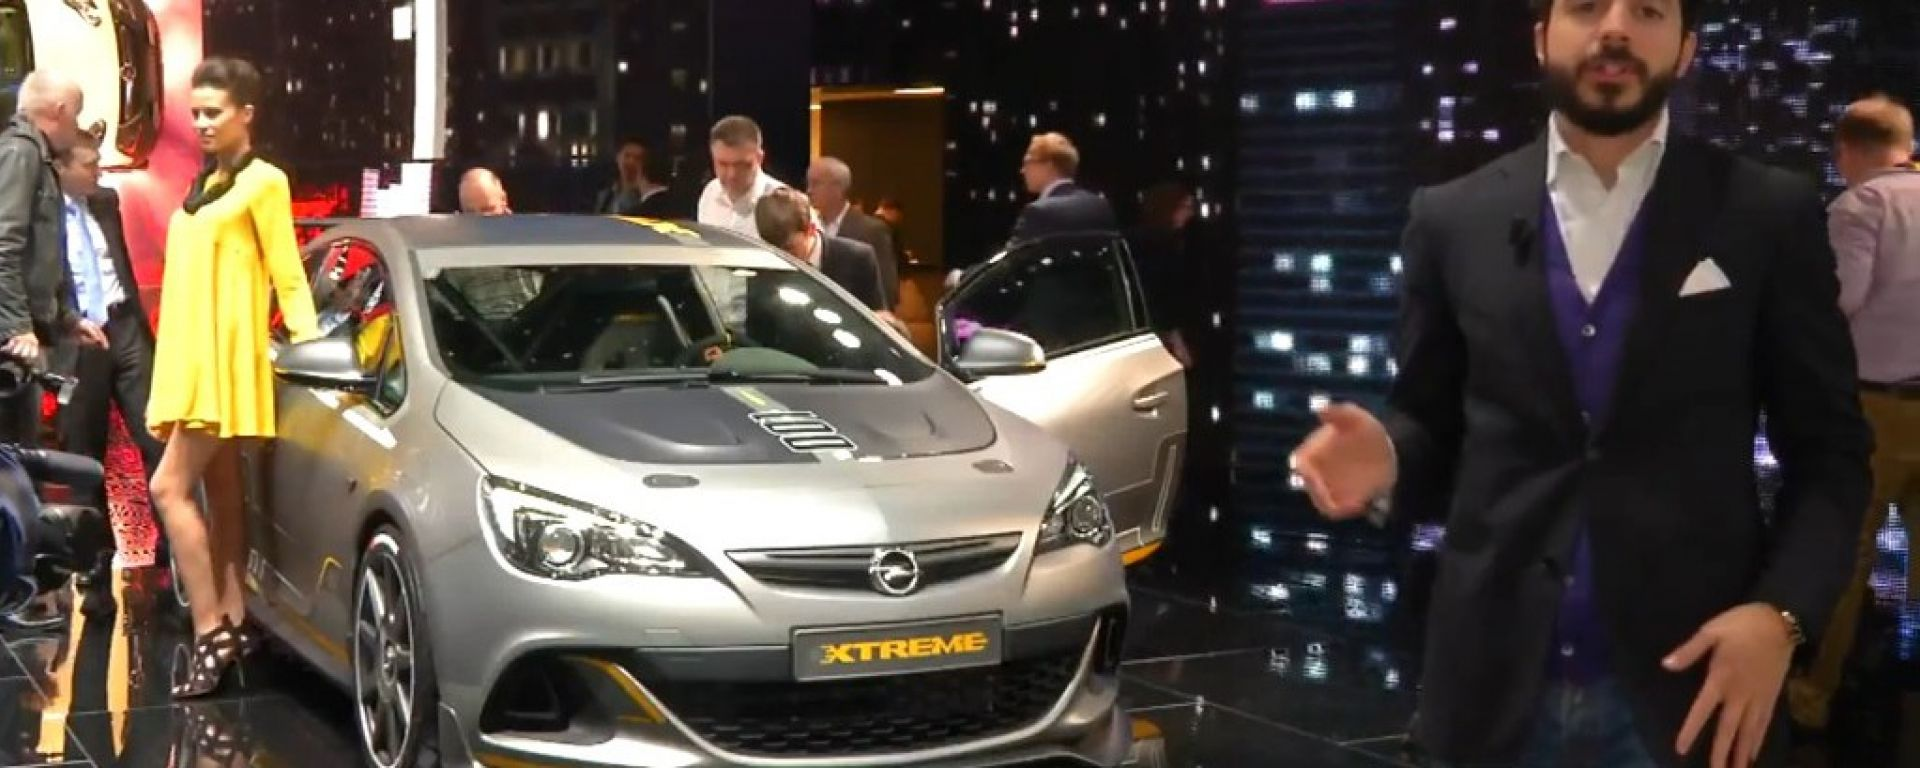 Salone di Ginevra 2014, lo stand Opel